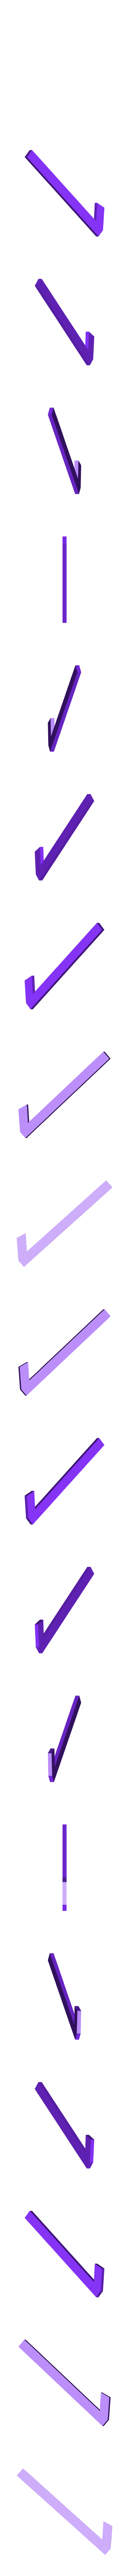 logo_100_1.stl Download free STL file iPhone6 case • Design to 3D print, tofuji